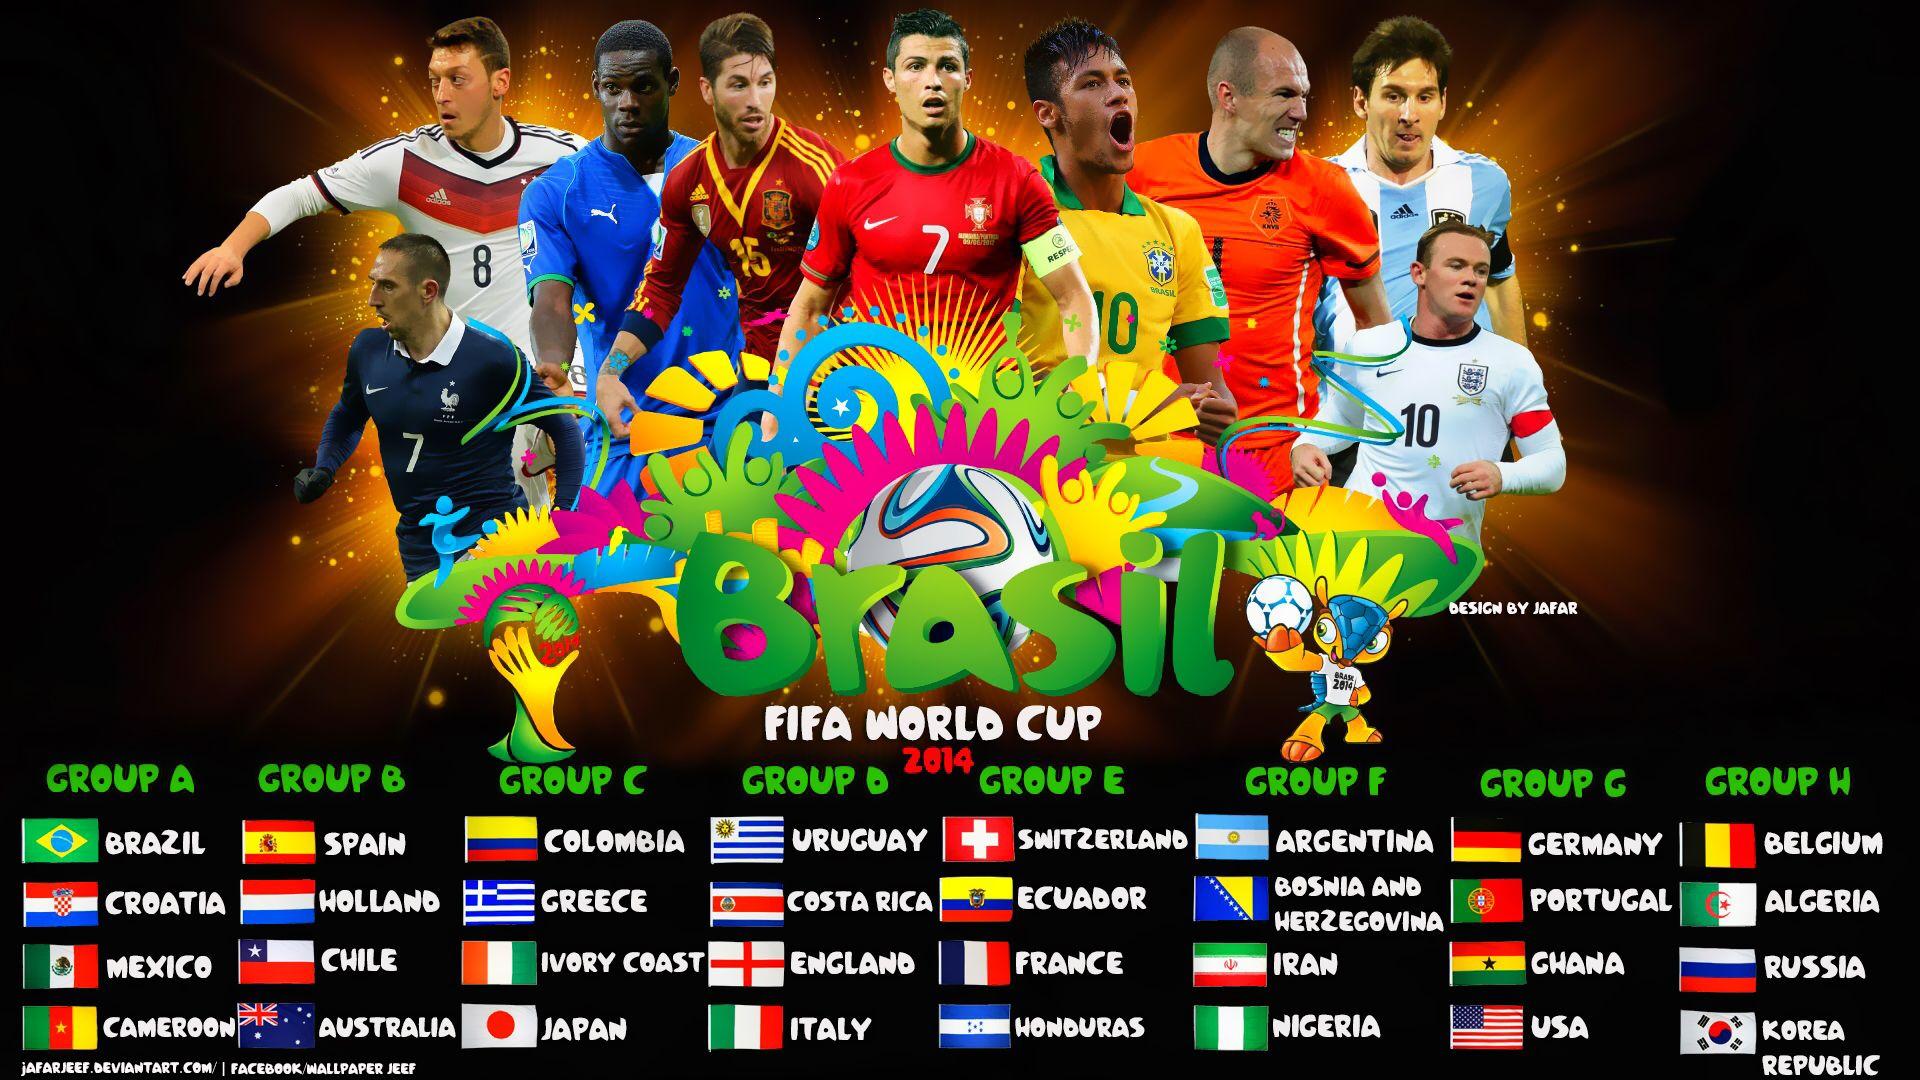 Fifa World Cup 2014 Hd Desktop Background Wallpaper Free World Cup 2014 World Cup World Cup Teams